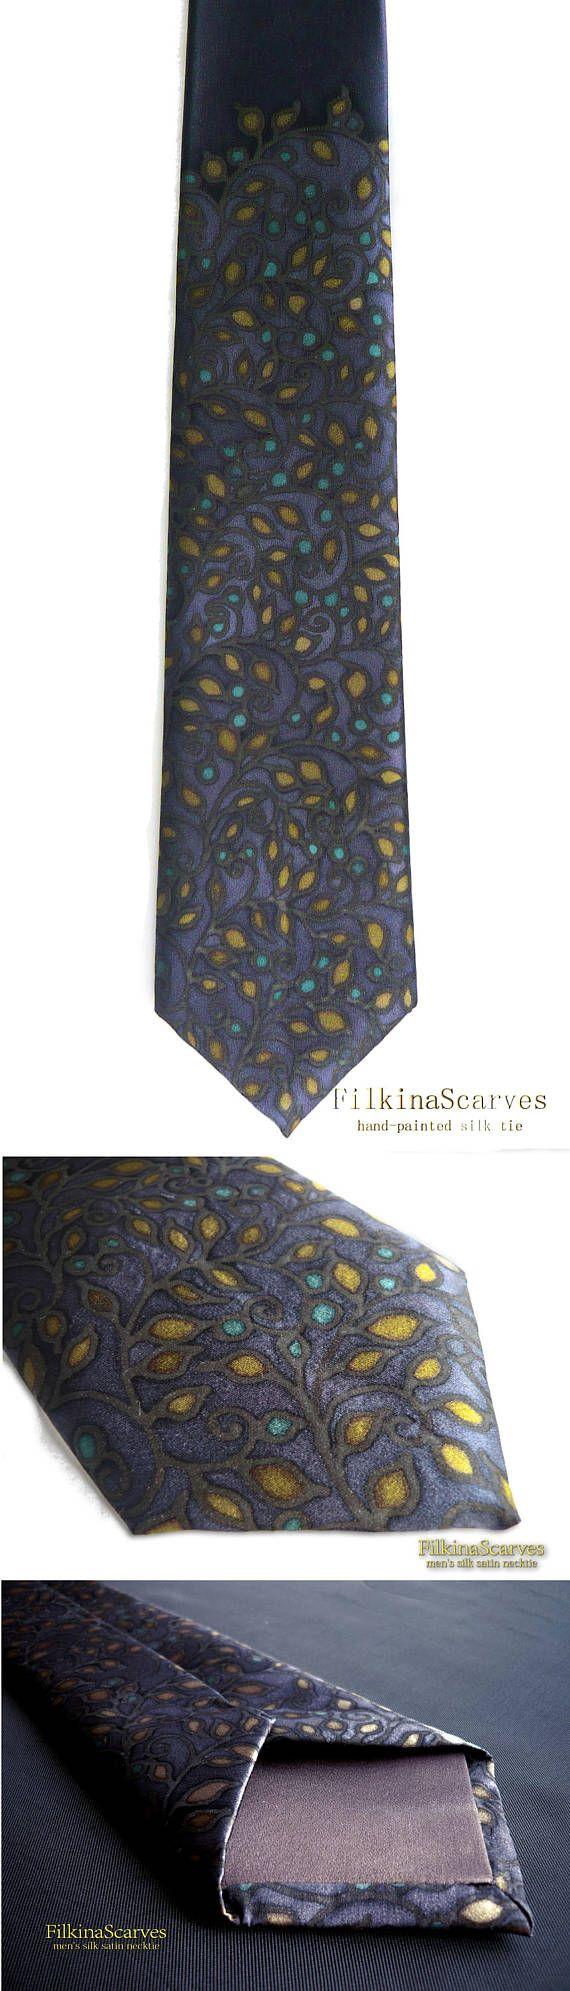 @FilkinaScarves Etsy Luxury Men's Silk Tie Hand Painted Necktie Denim tie Olive Leaves Navy Tie  Batik Men's Fashion Wedding Tie Groomsmen tie Mens gift FS 45